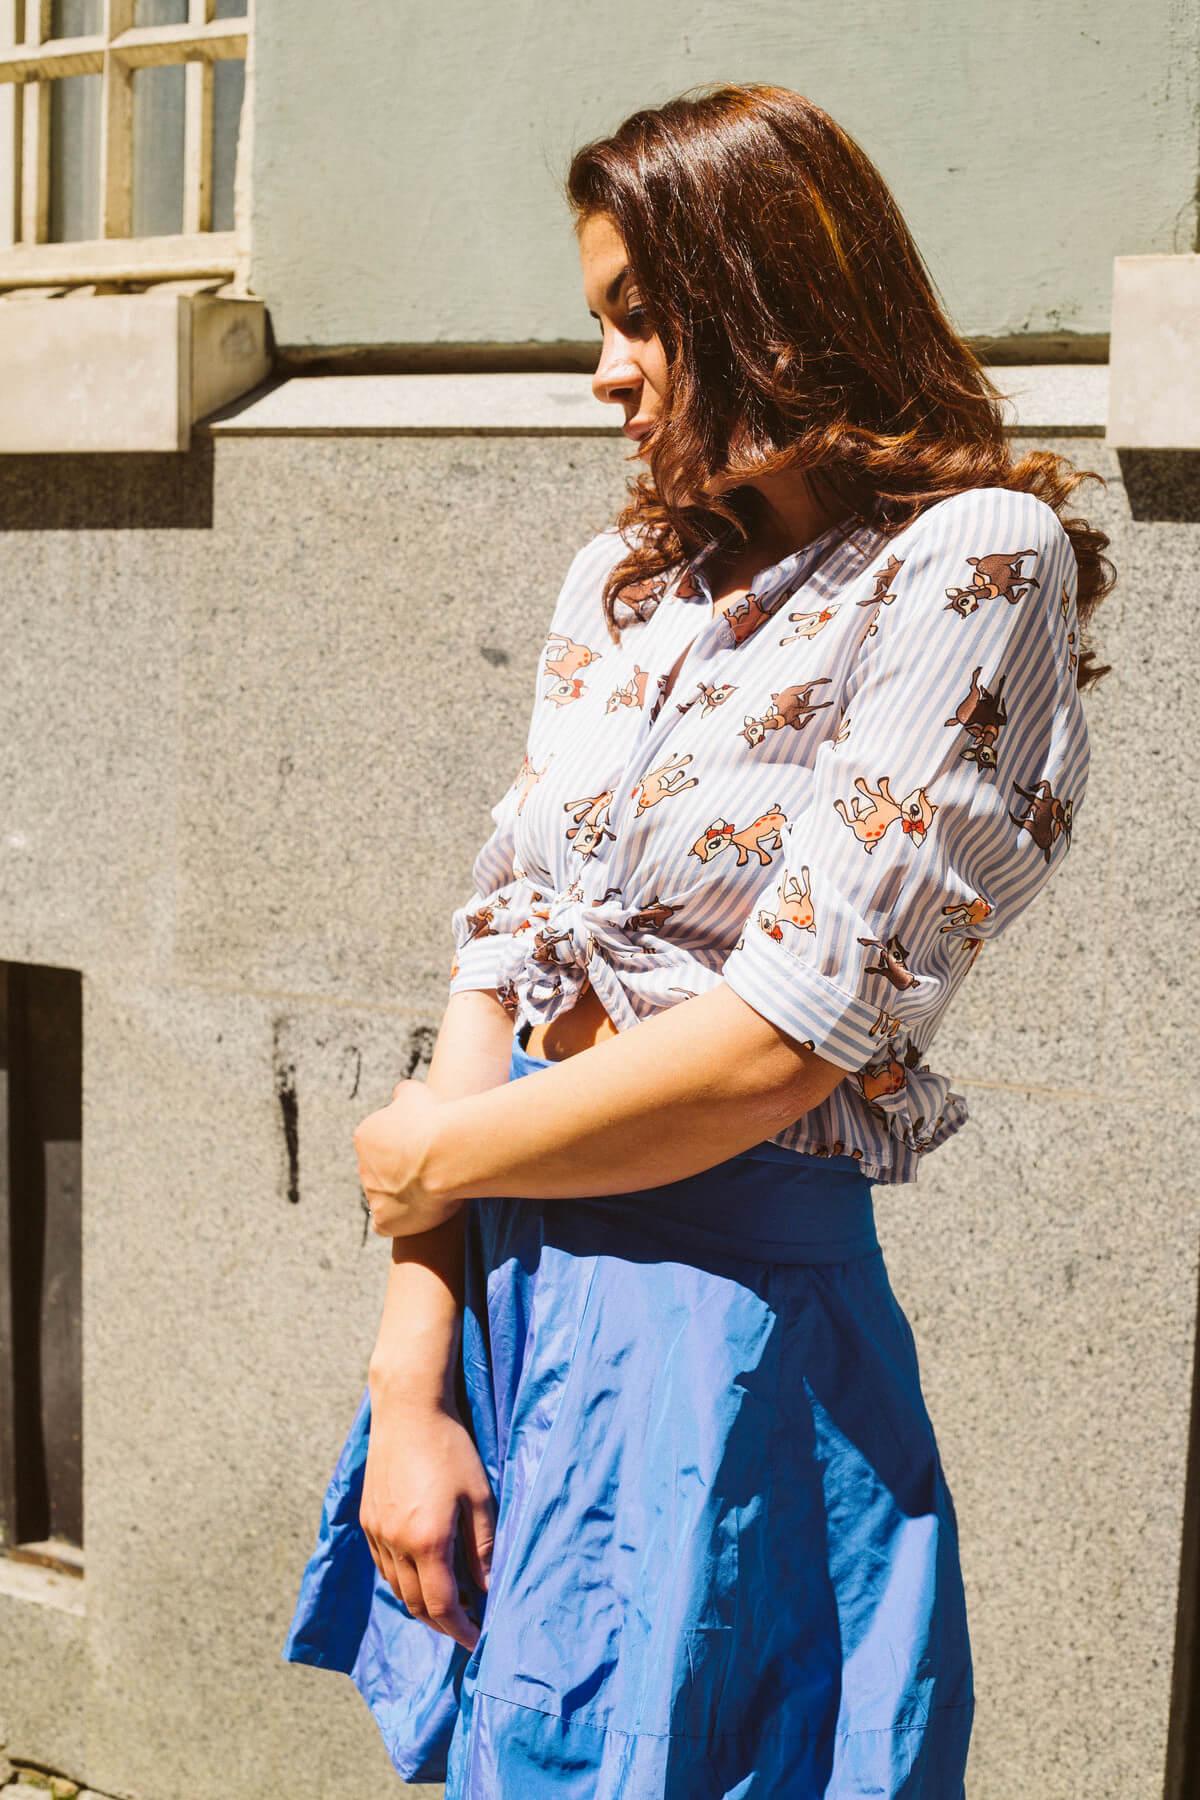 blue skirt and bambi shirt